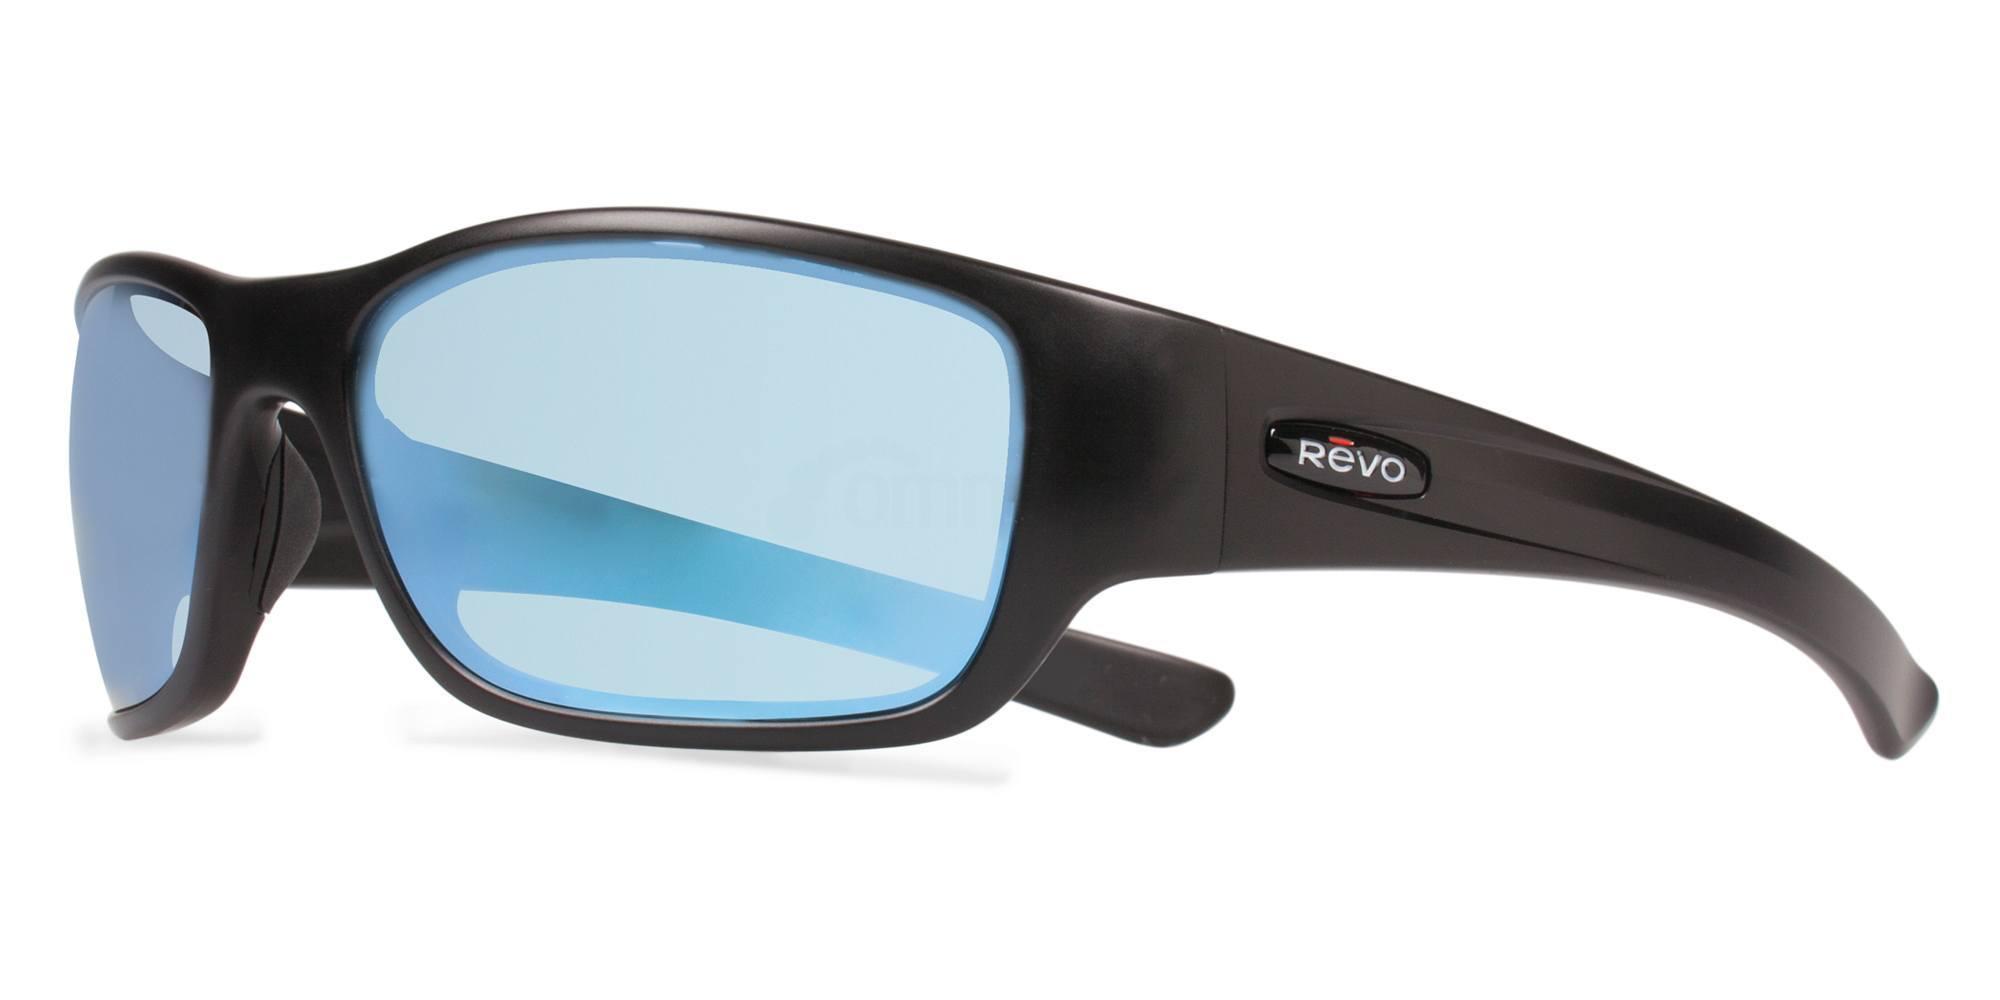 01BL Heading - 354058 , Revo